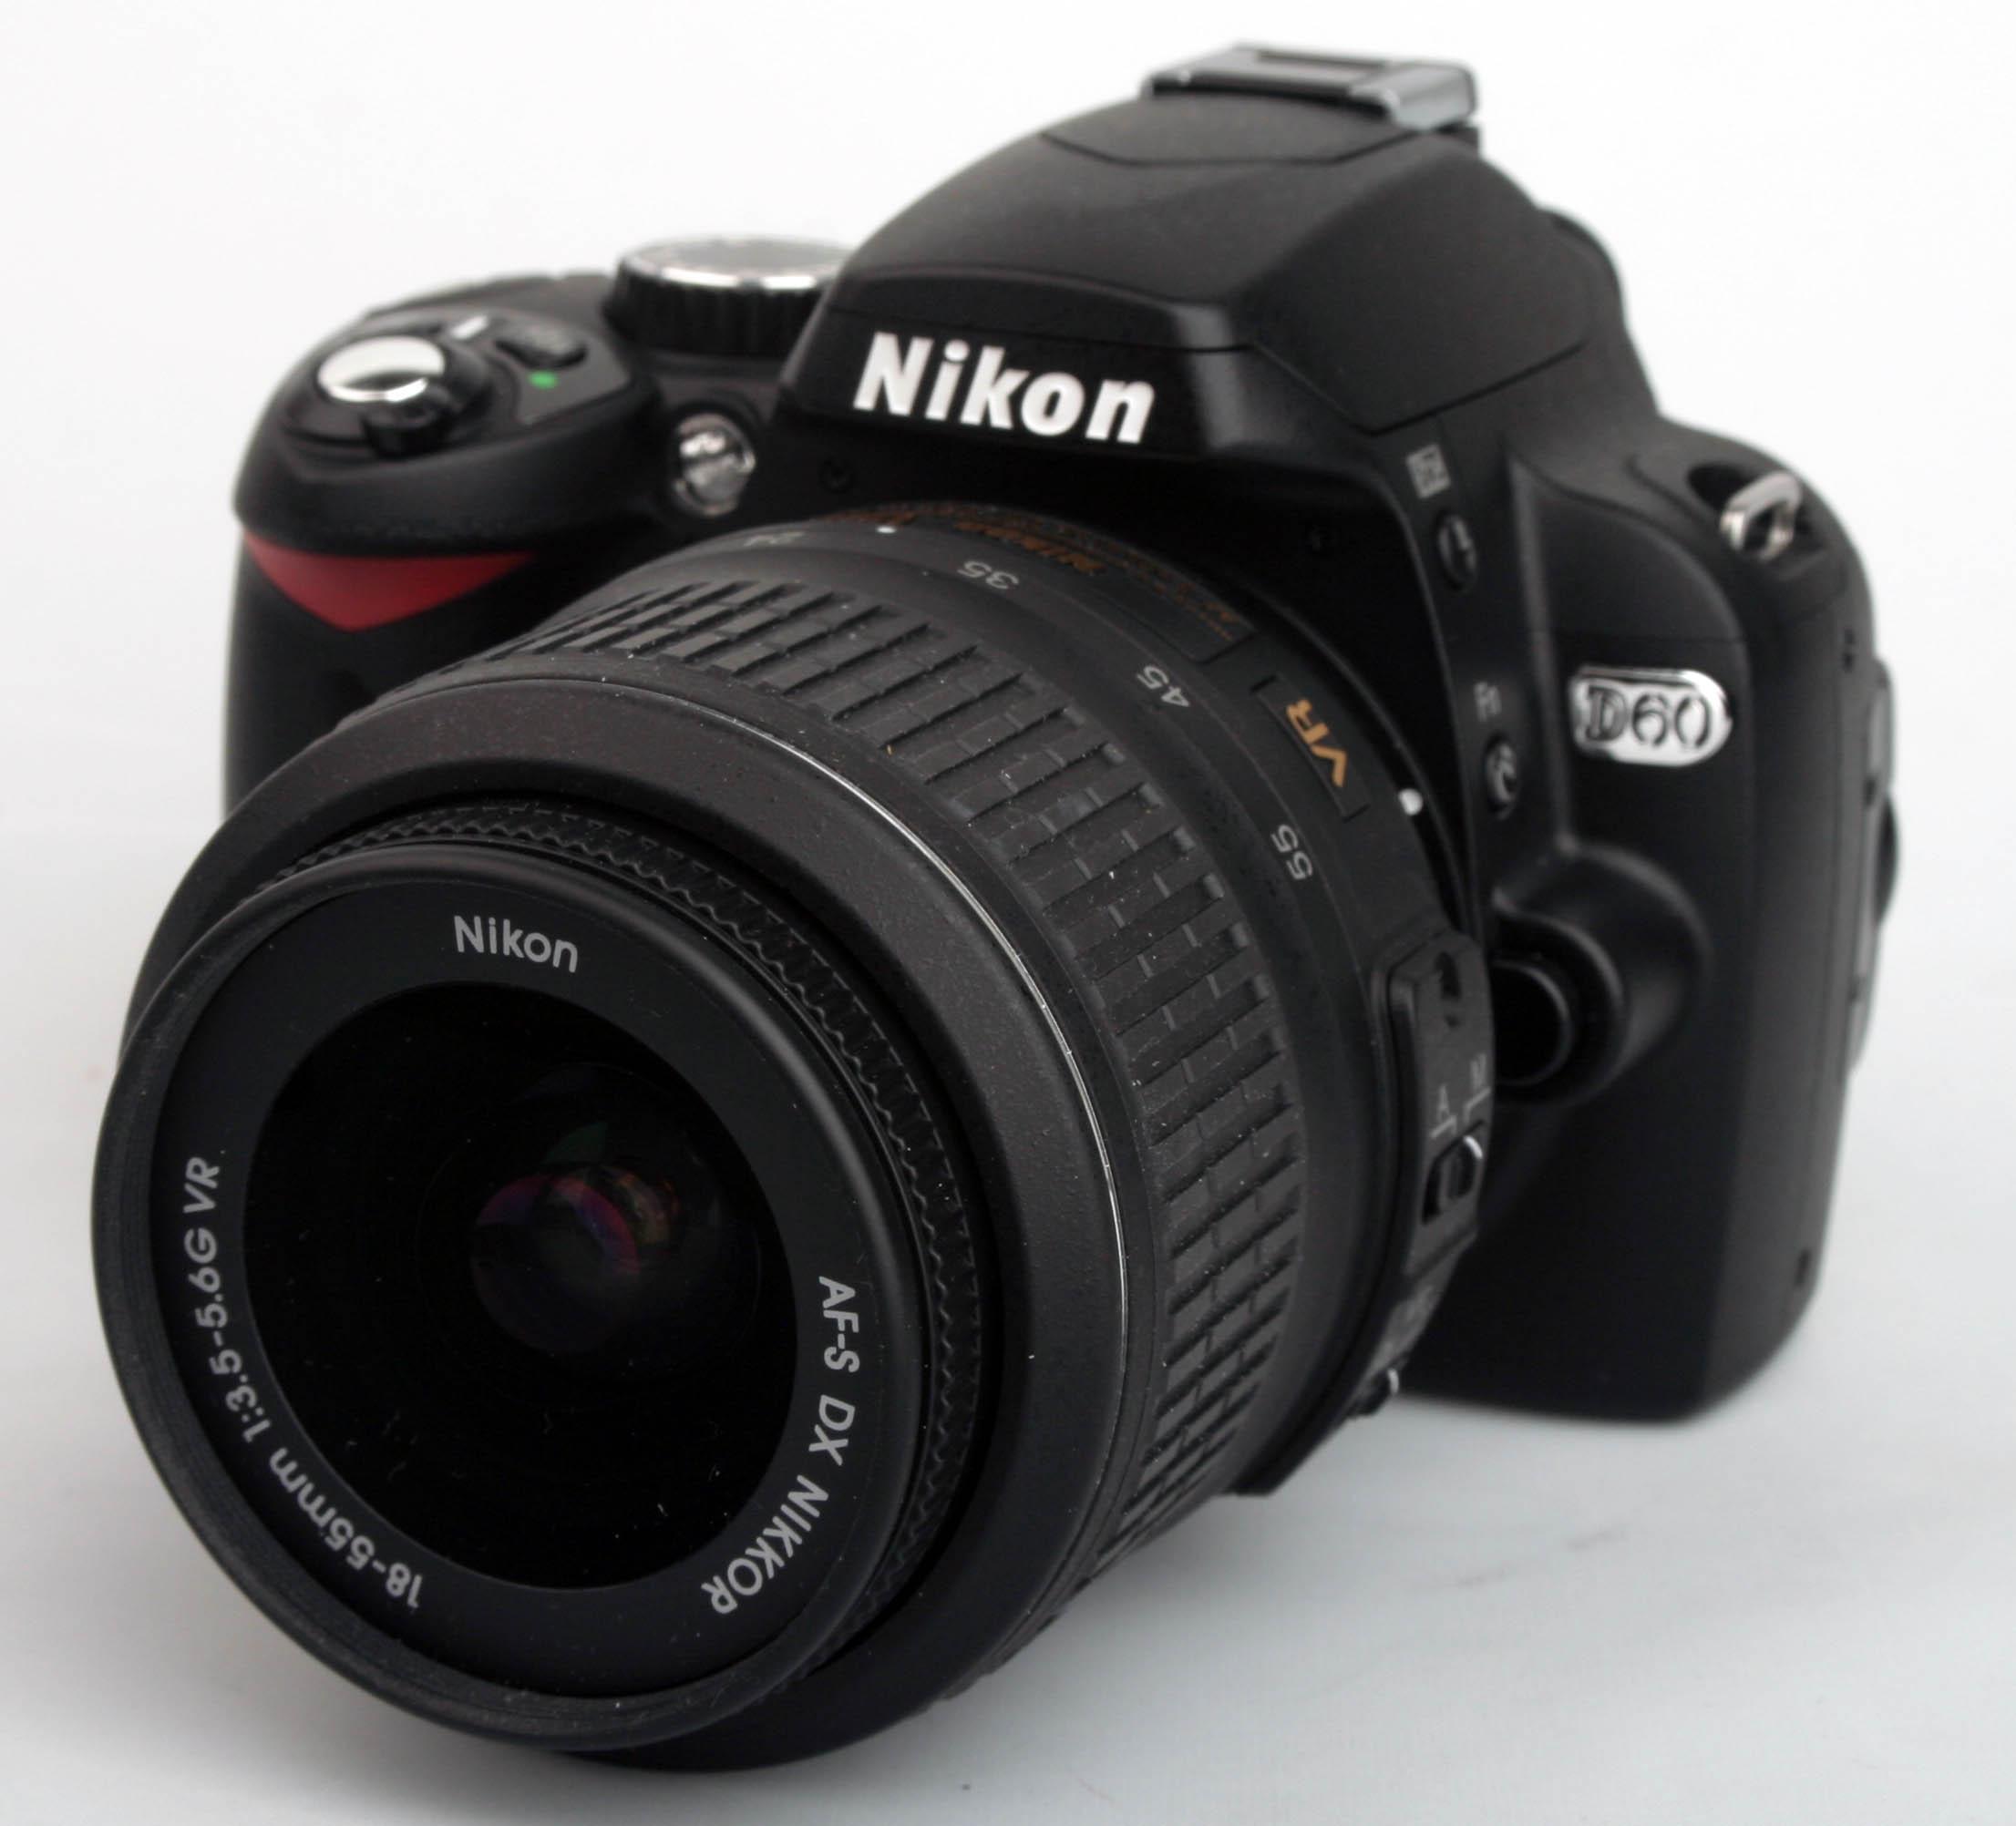 Nikon D60 Digital SLR Review | ePHOTOzine